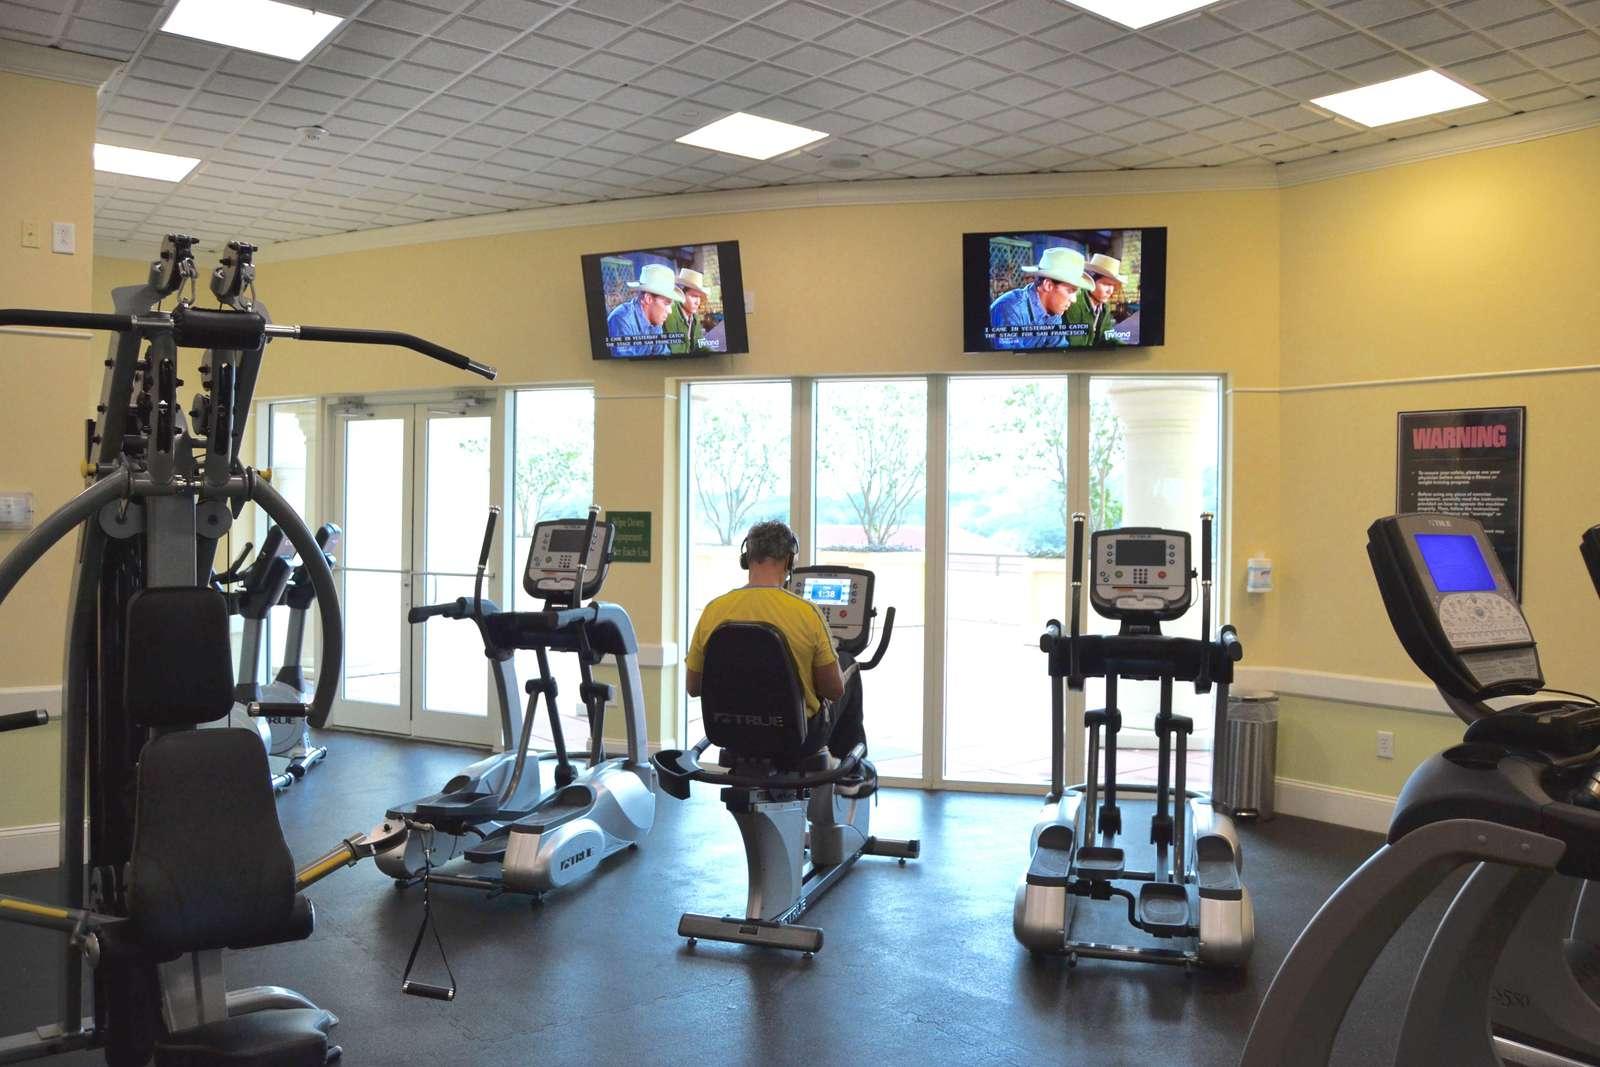 5Th Floor, Fitness Center